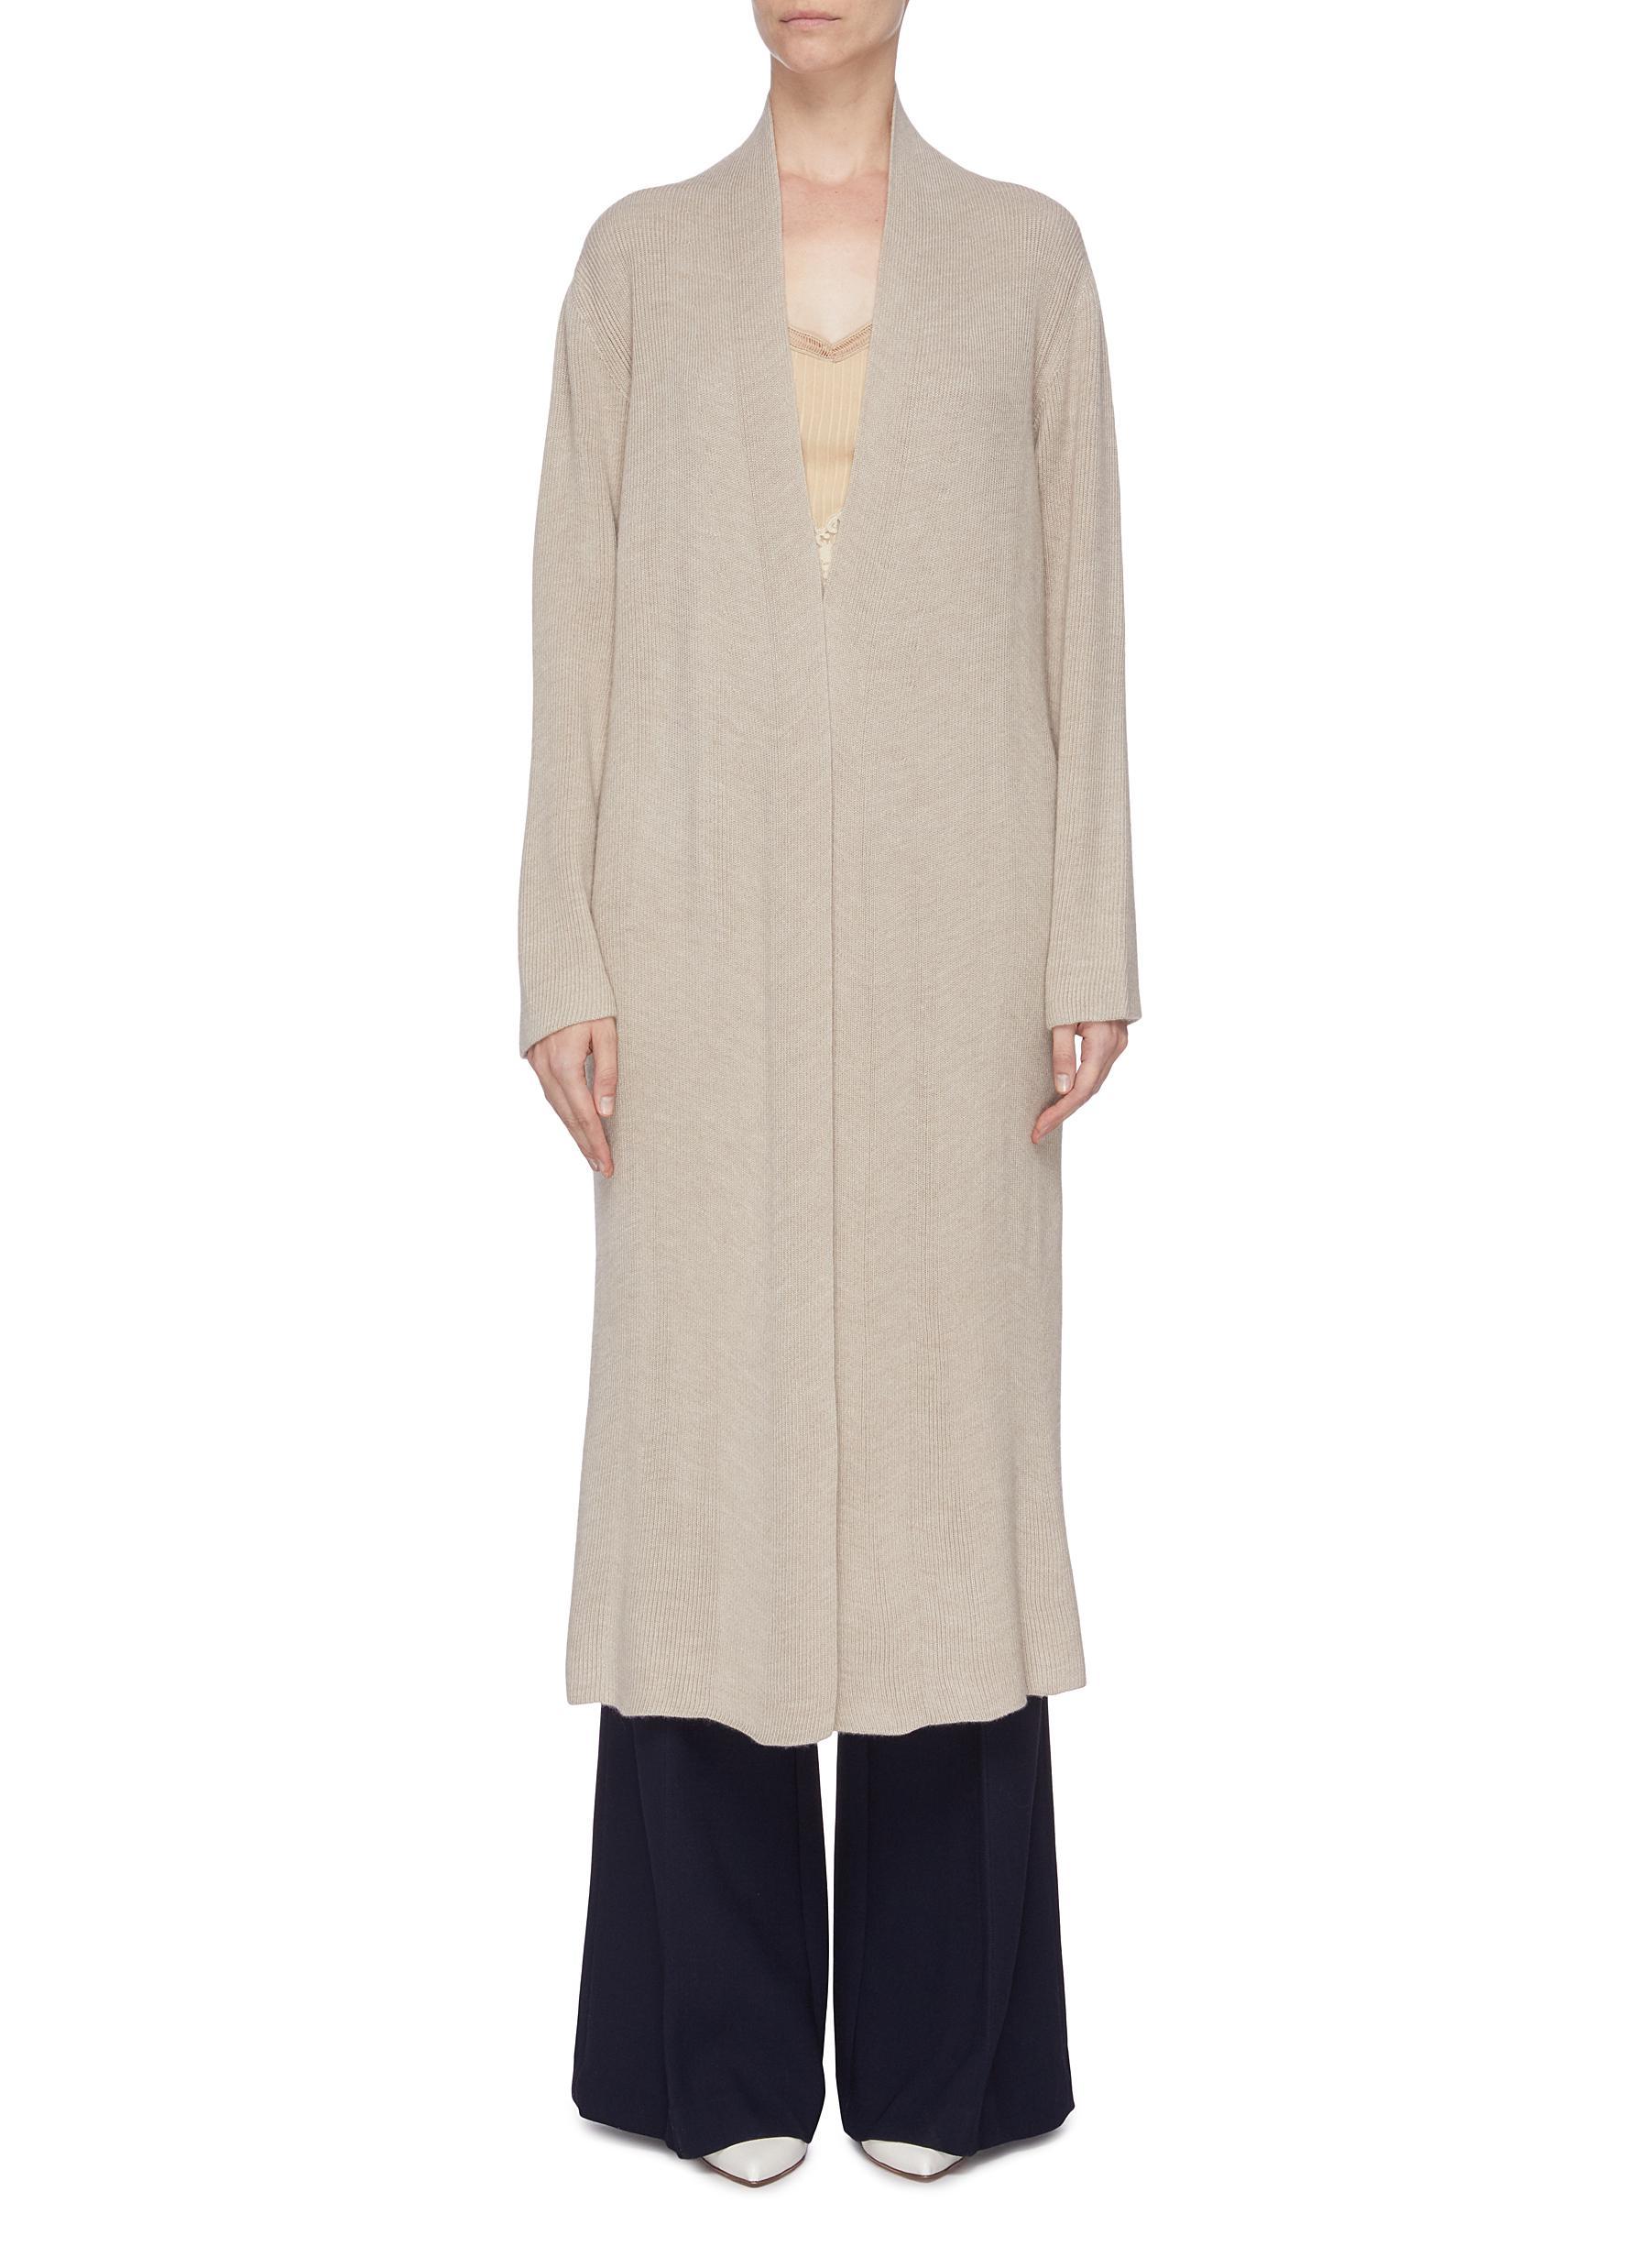 shop Gabriela Hearst 'Llorona' cashmere open cardigan online